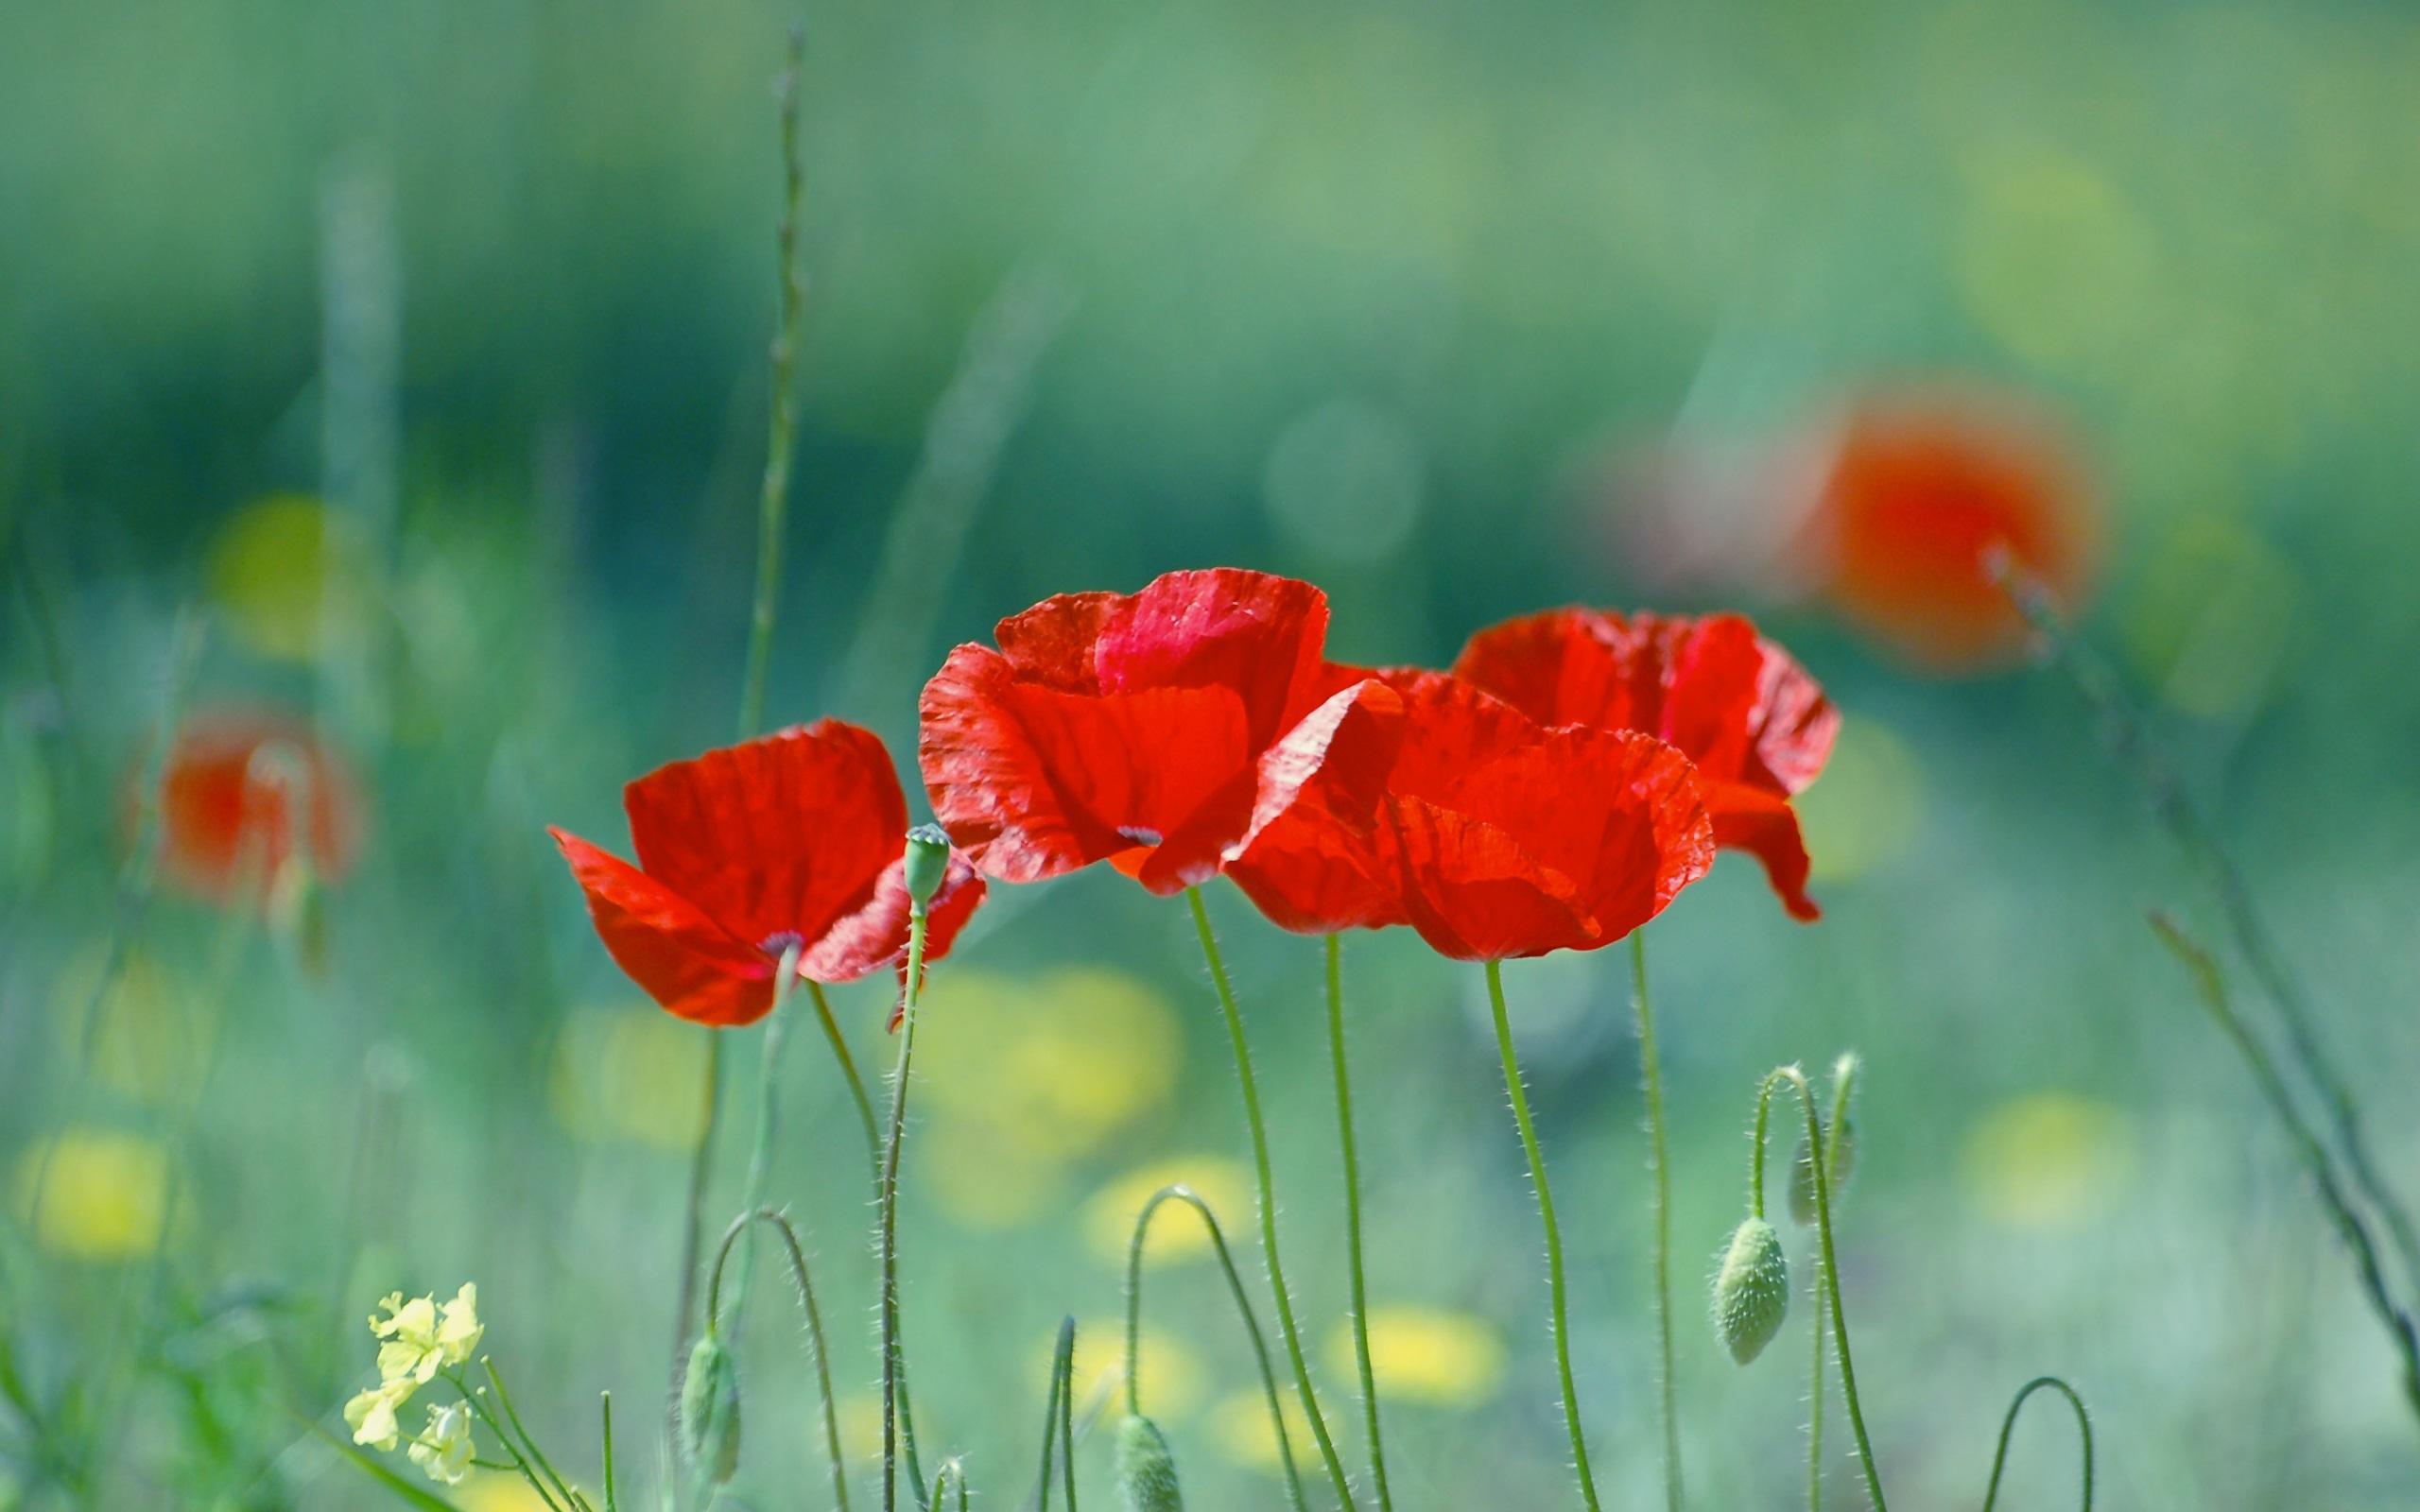 Flower Poppies , HD Wallpaper & Backgrounds